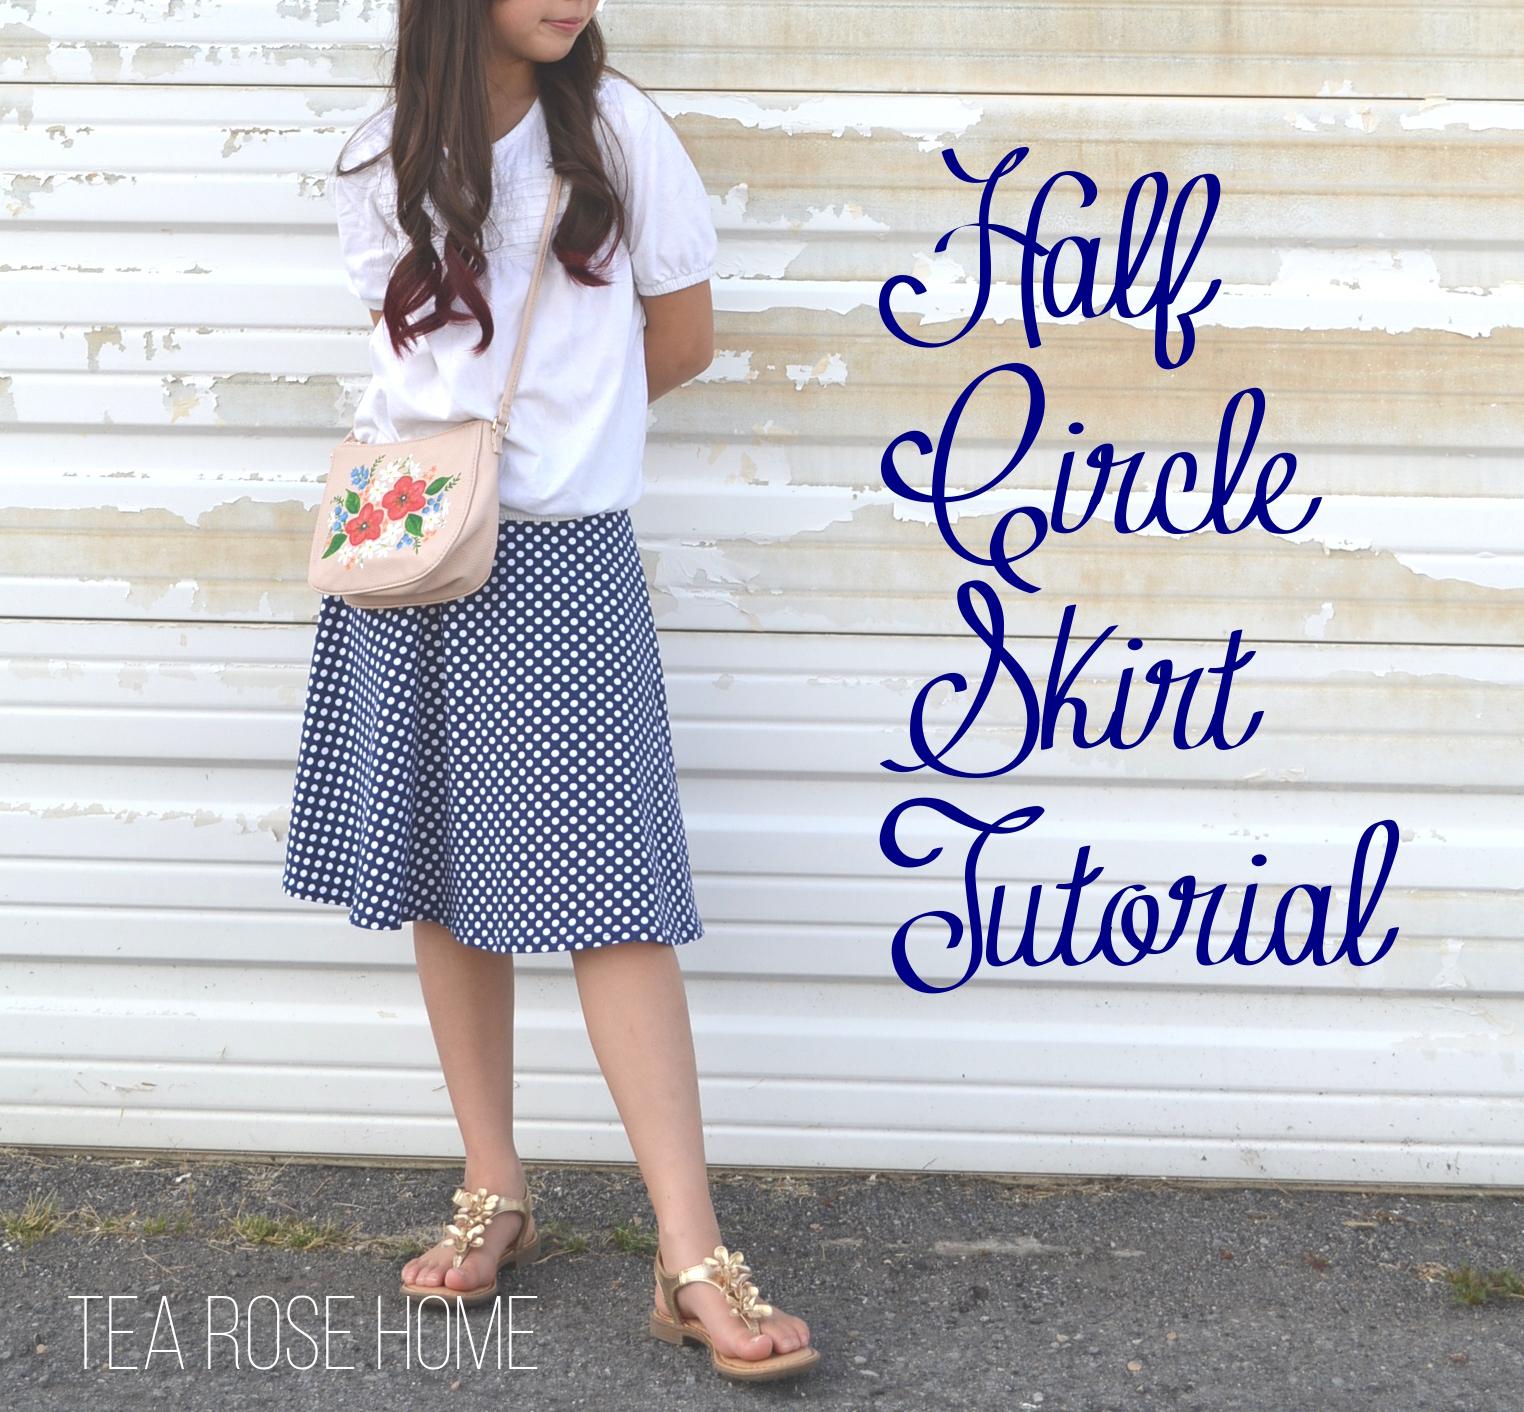 be4b84d195 Tea Rose Home  Tutorial~ Half Circle Skirt  Skirting the Issue